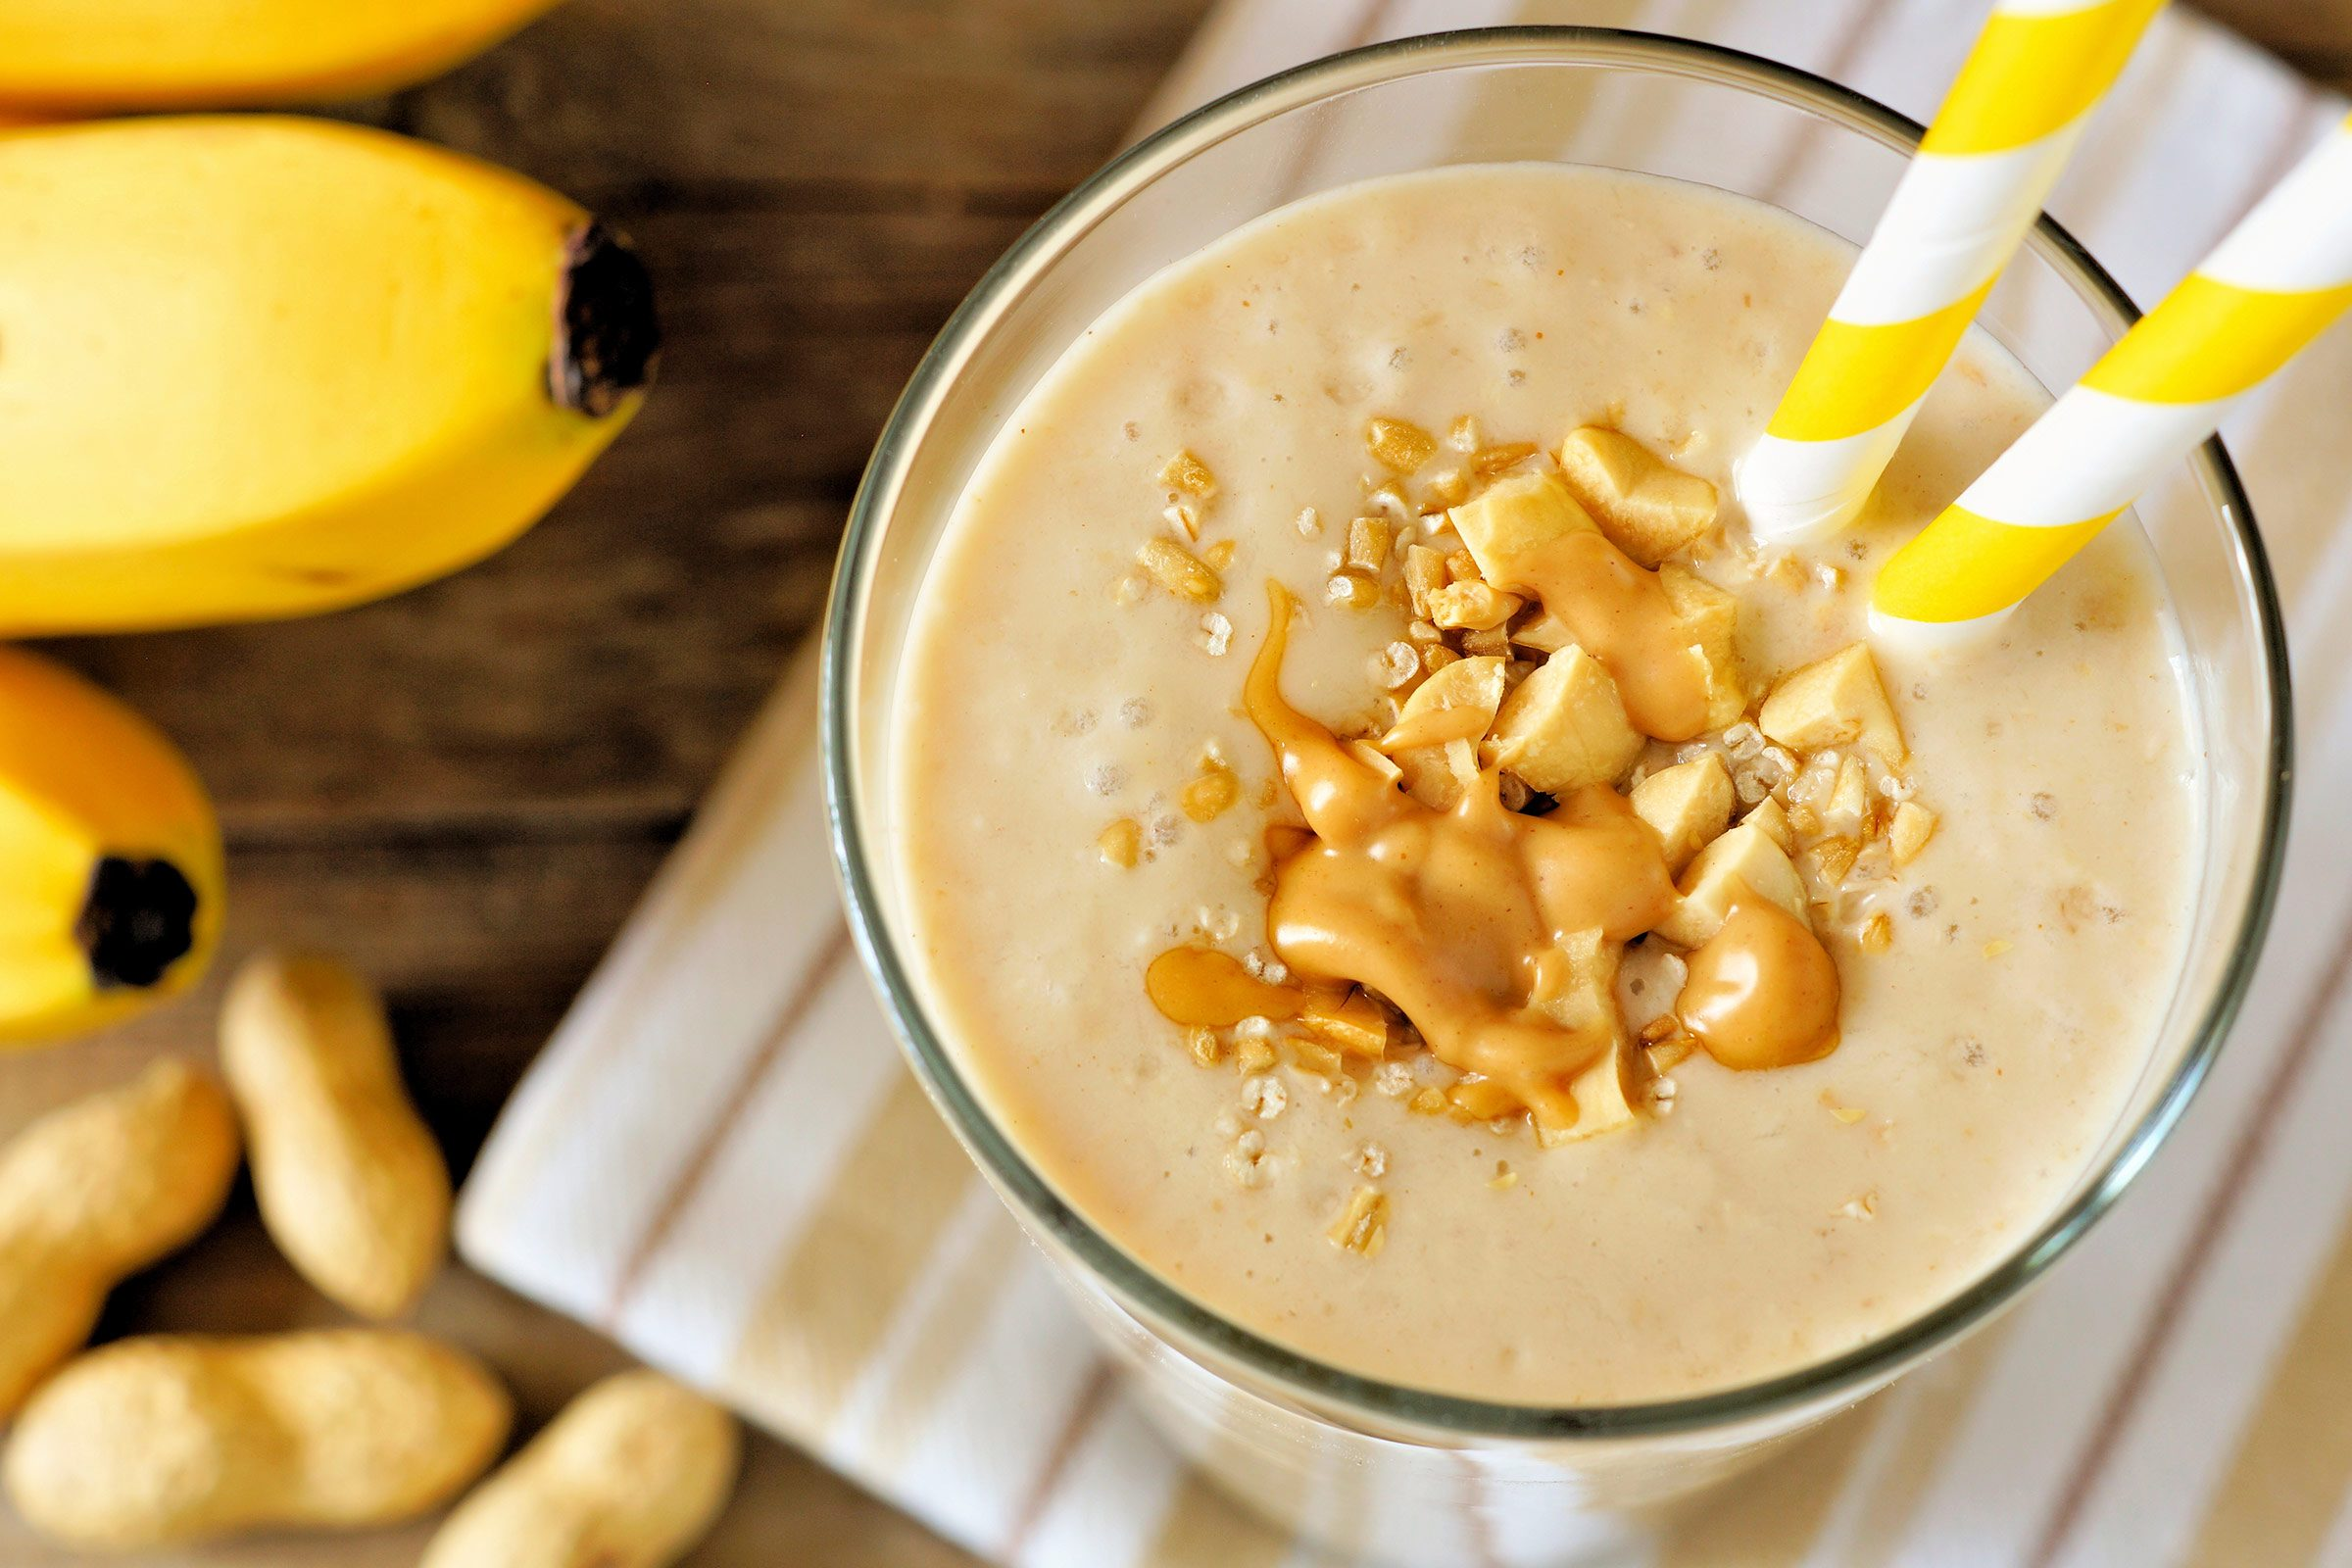 01-recipes-remember-elvis-presley-banana-peanut-butter-smoothie